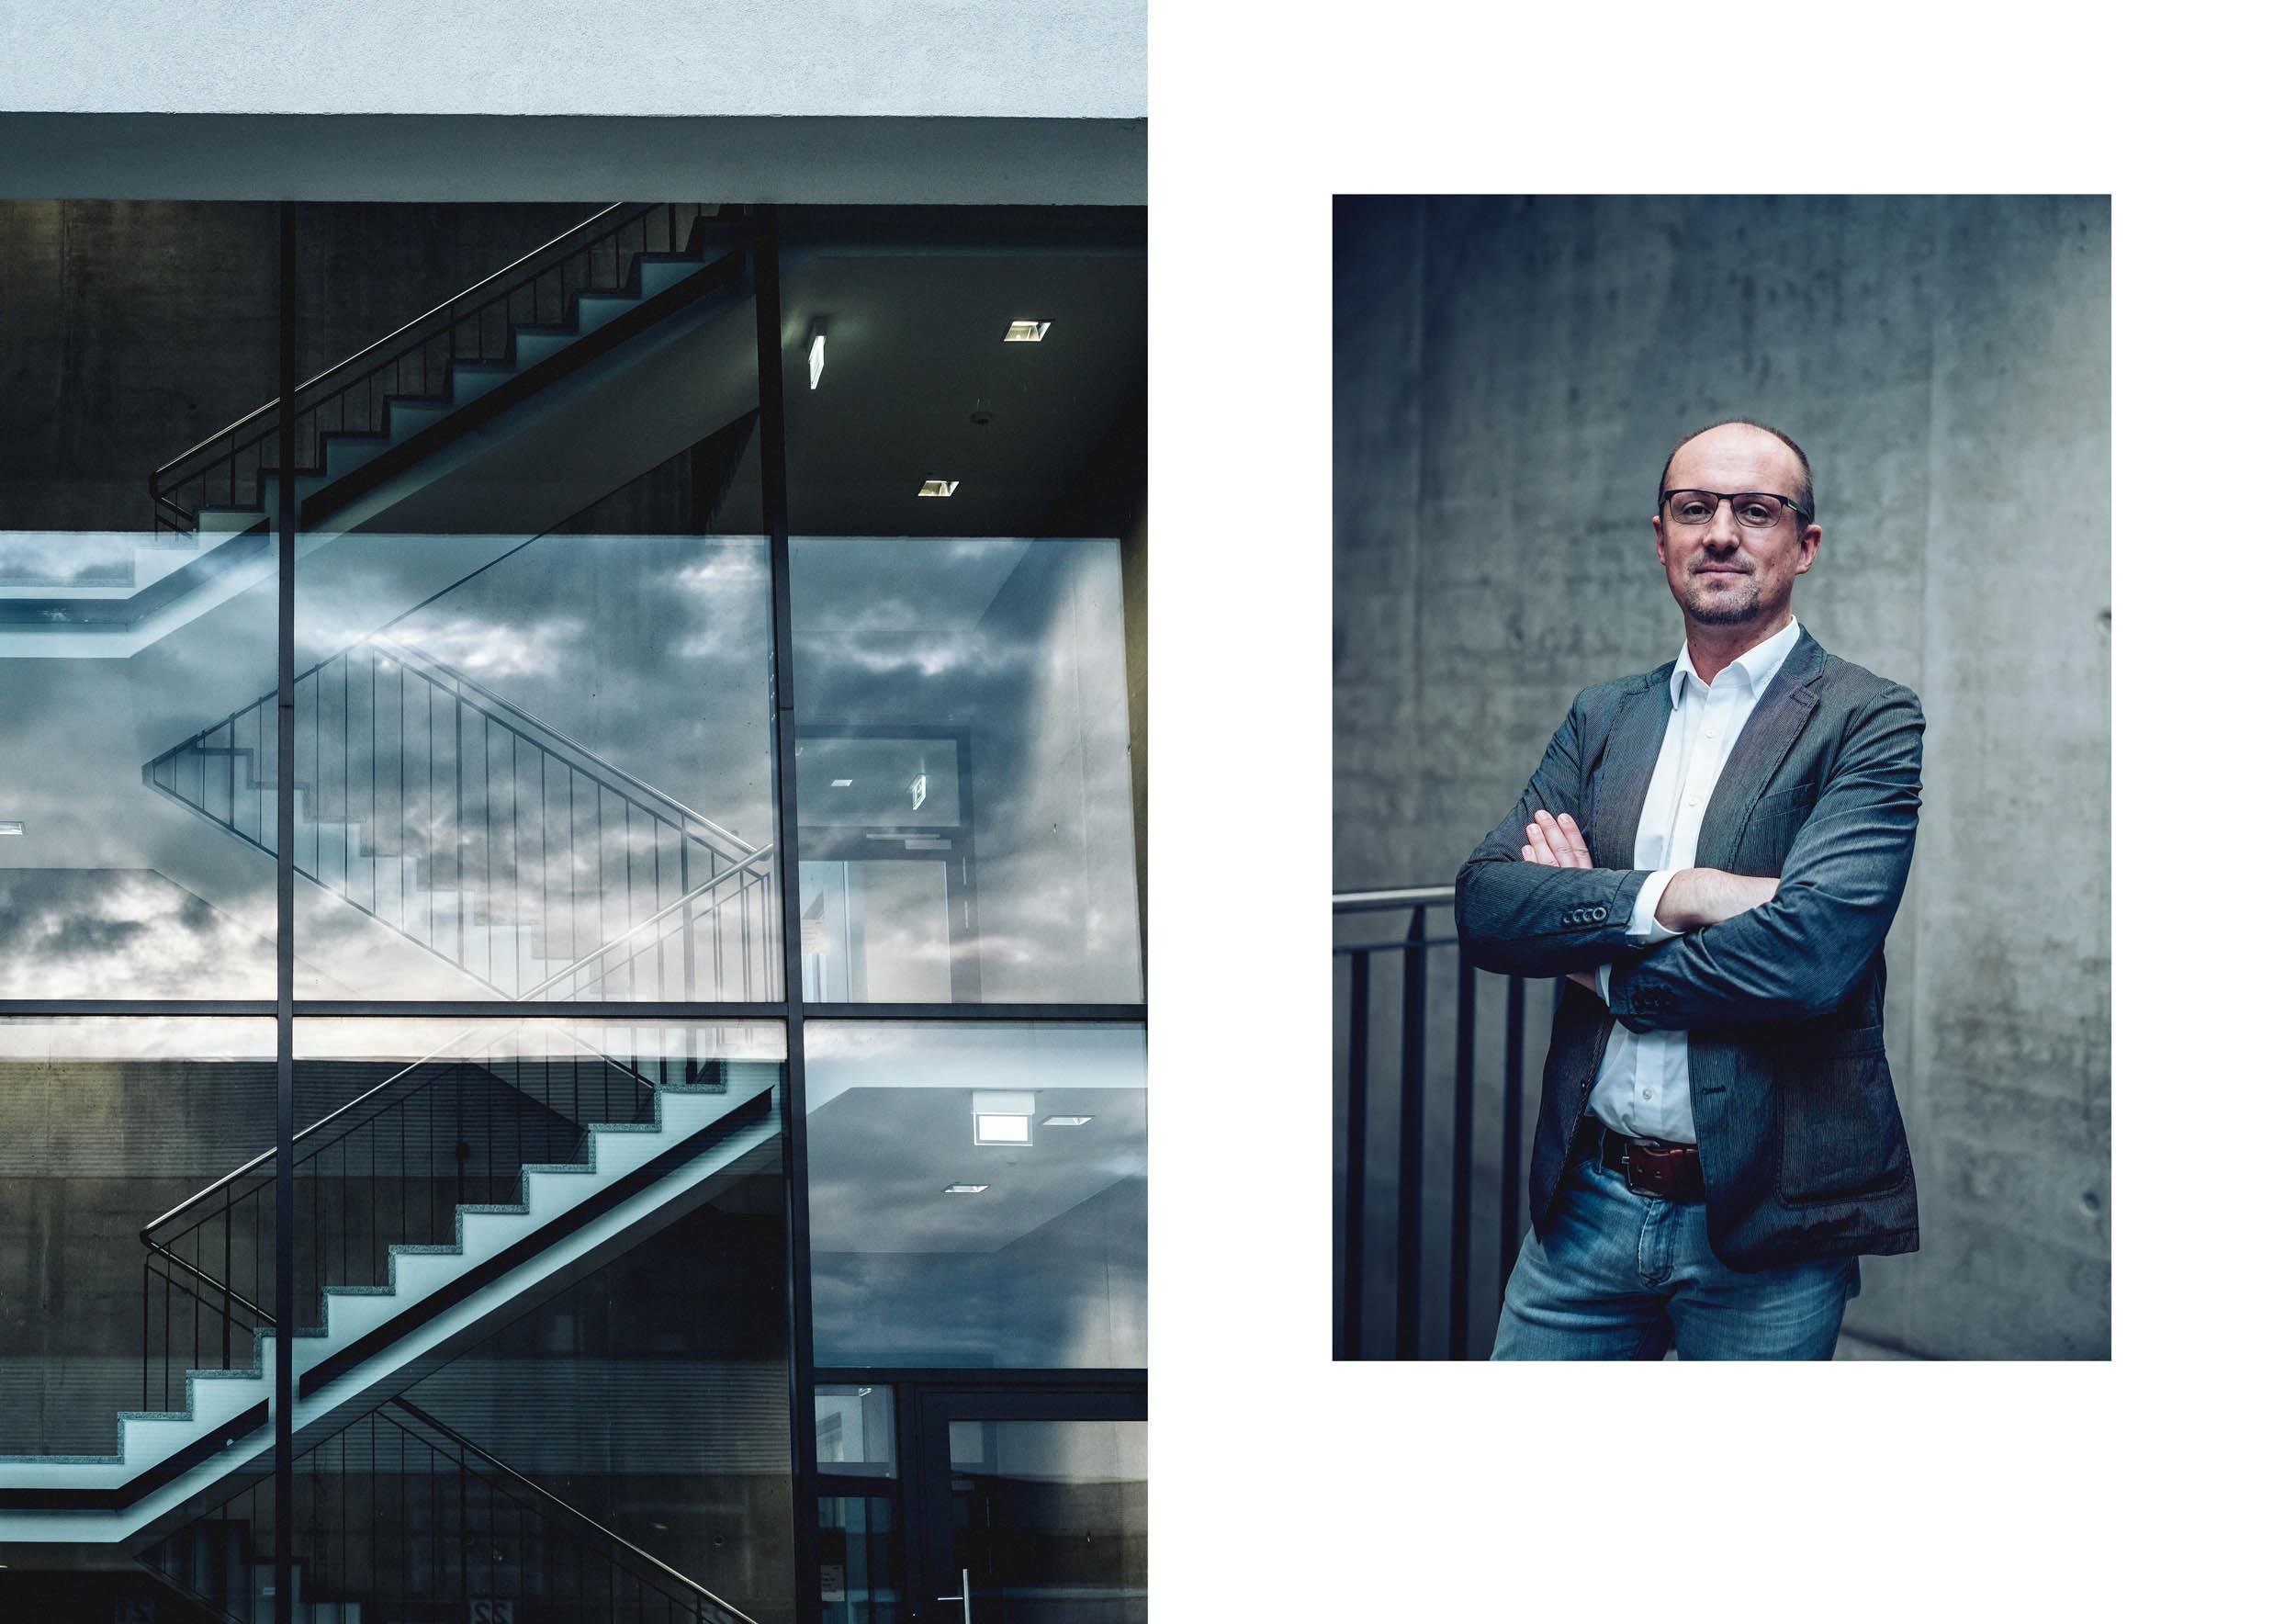 2018_SeifertUebler_schueller_kuechen_corporate_portrait_industrial_photography_007.jpg